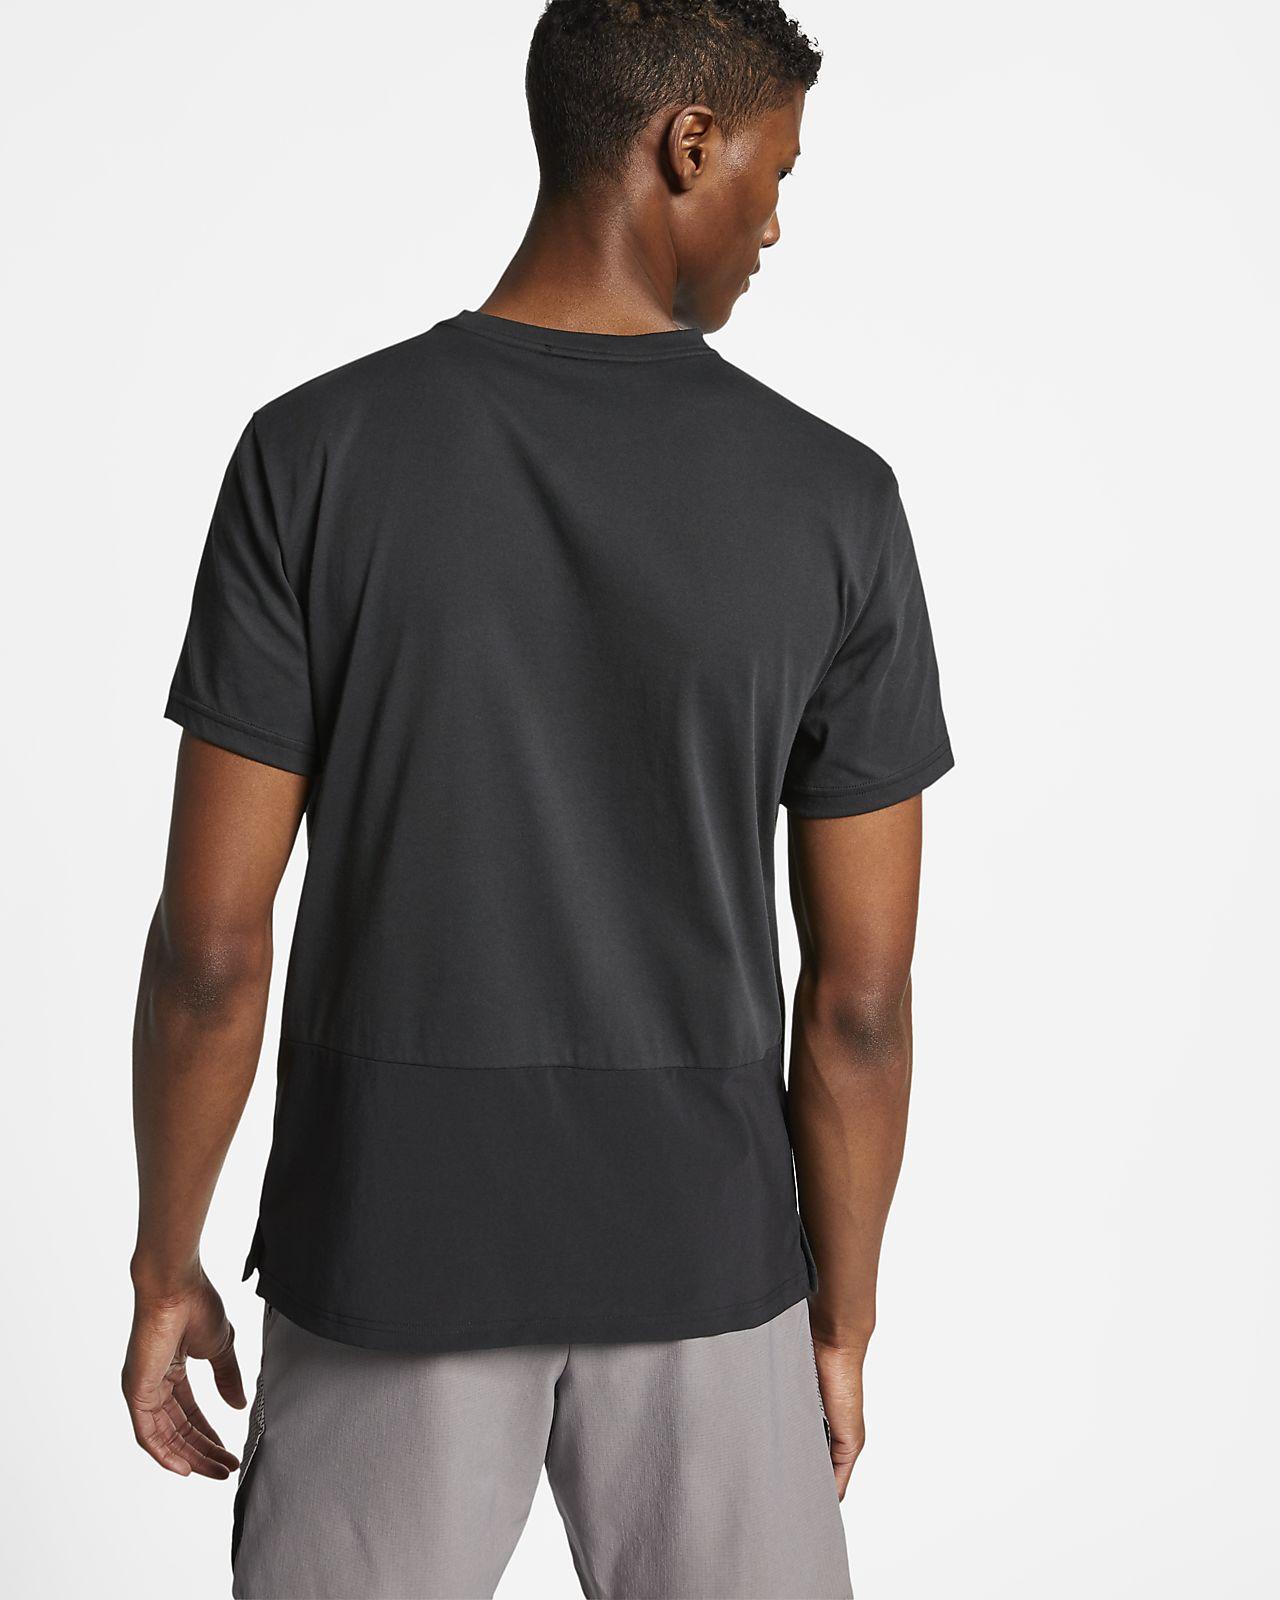 Nike Dri FIT Men's Short Sleeve Training Top